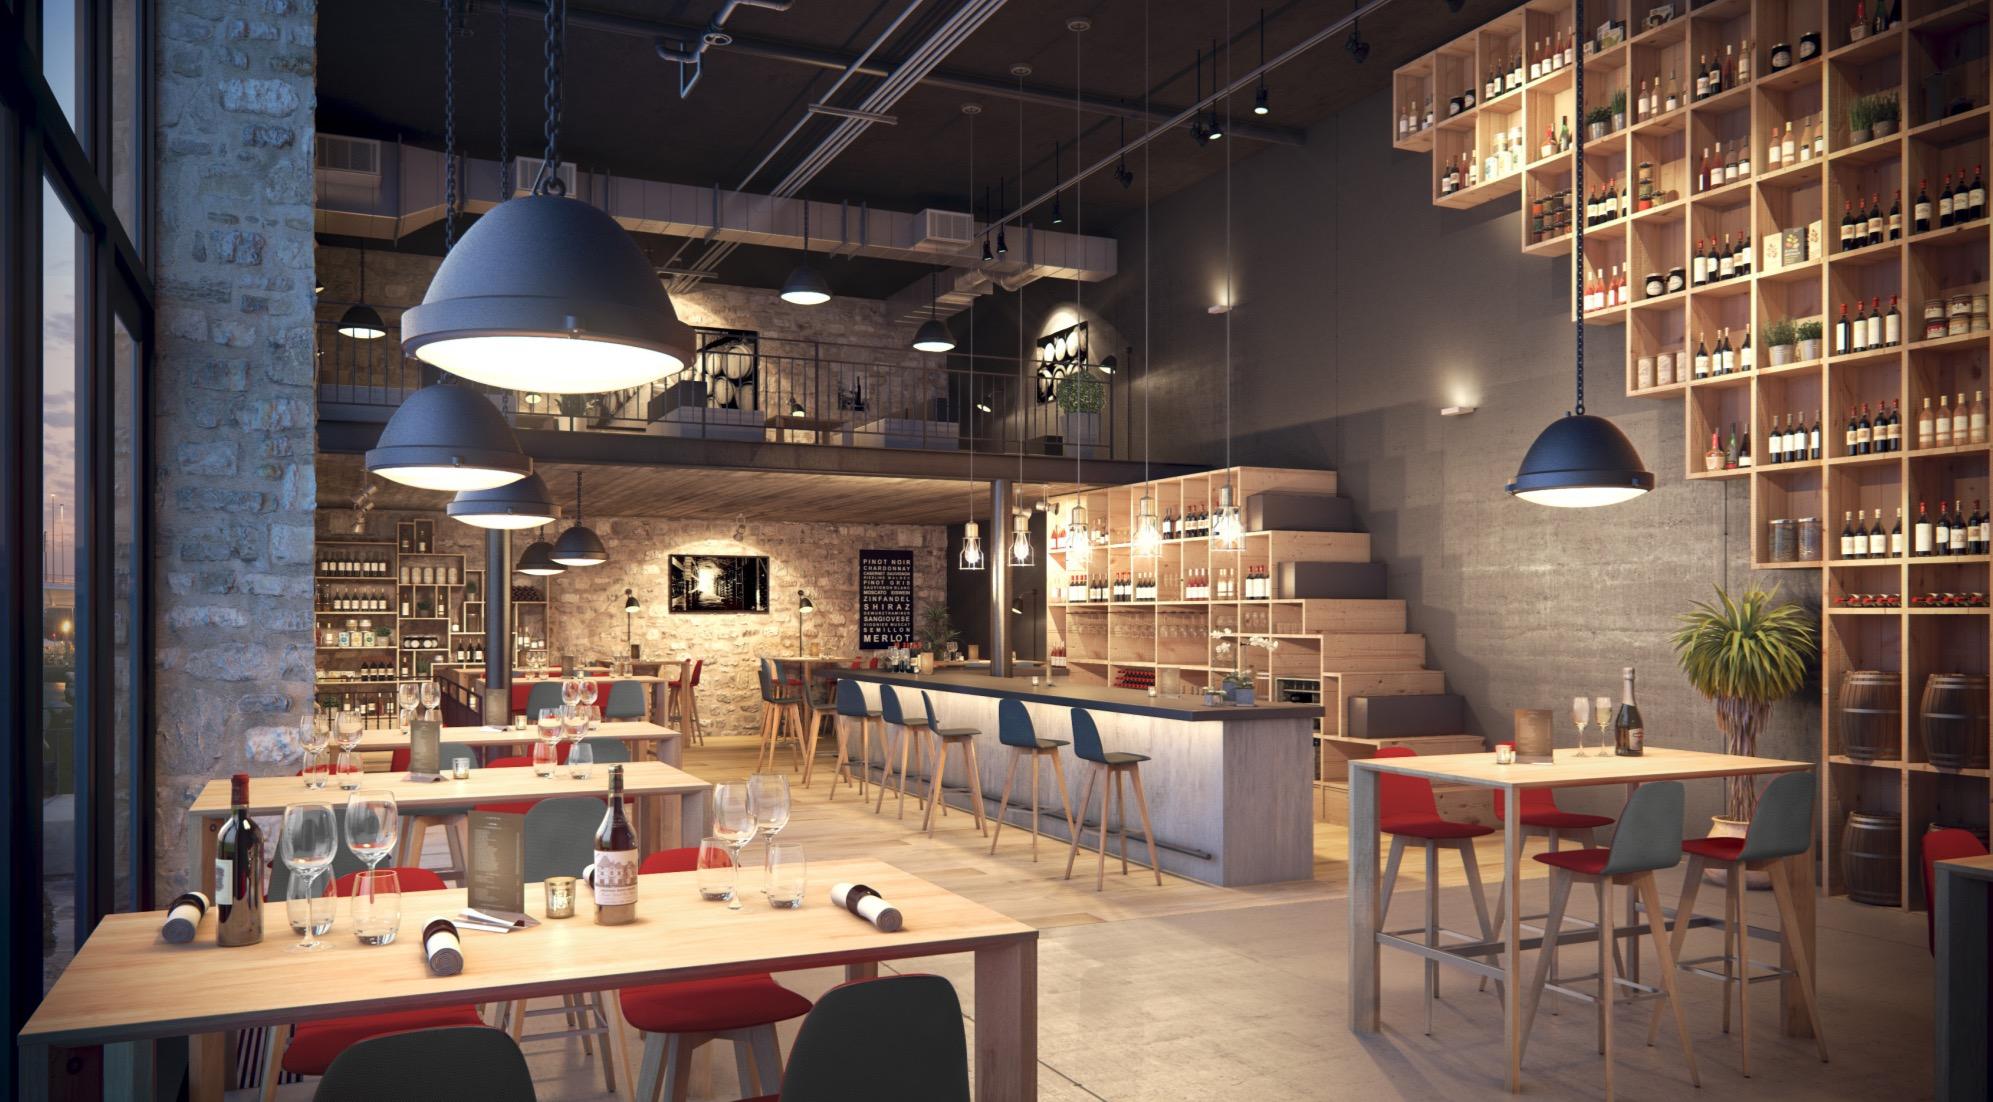 Hotel & Restaurant Furniture Scotland UK